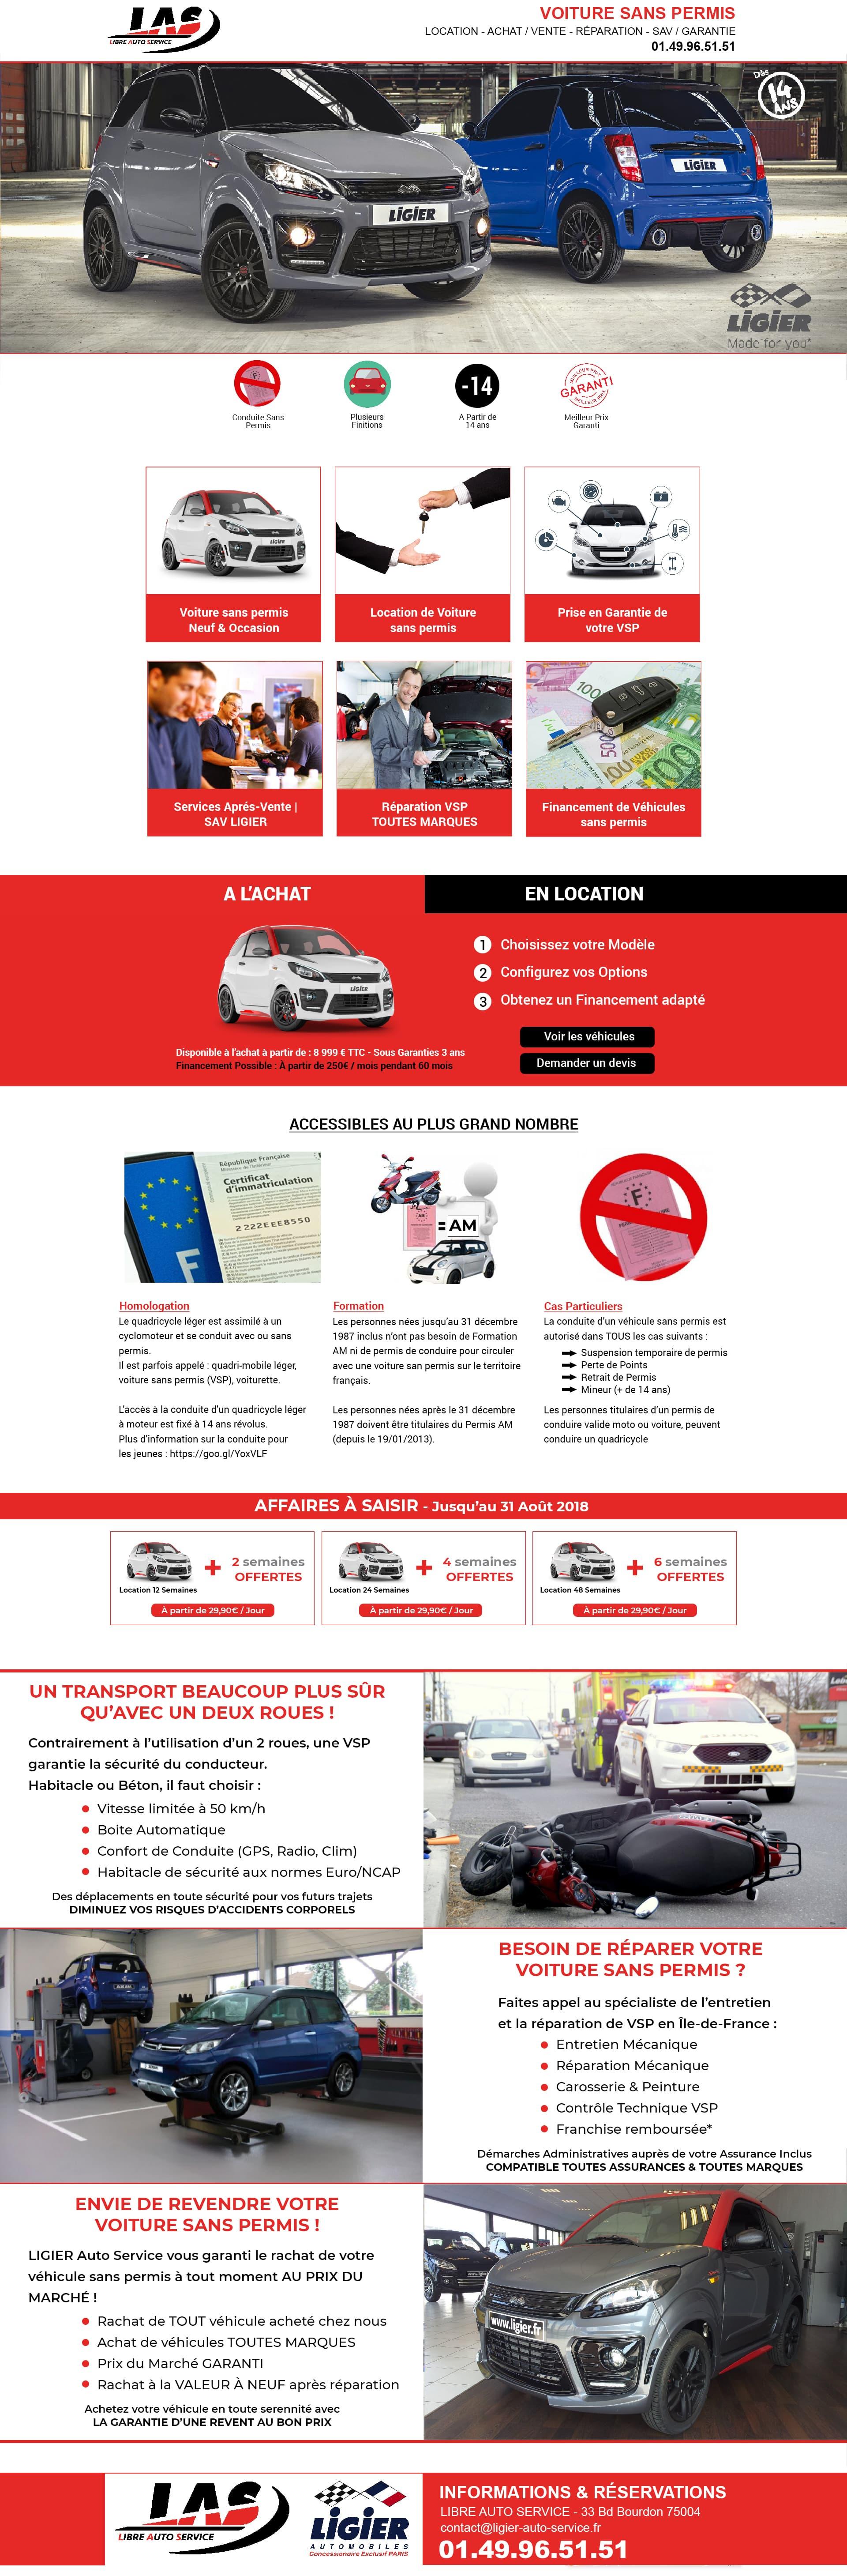 LAS-Landing-Page-Agence-webmarketing-Paris-min